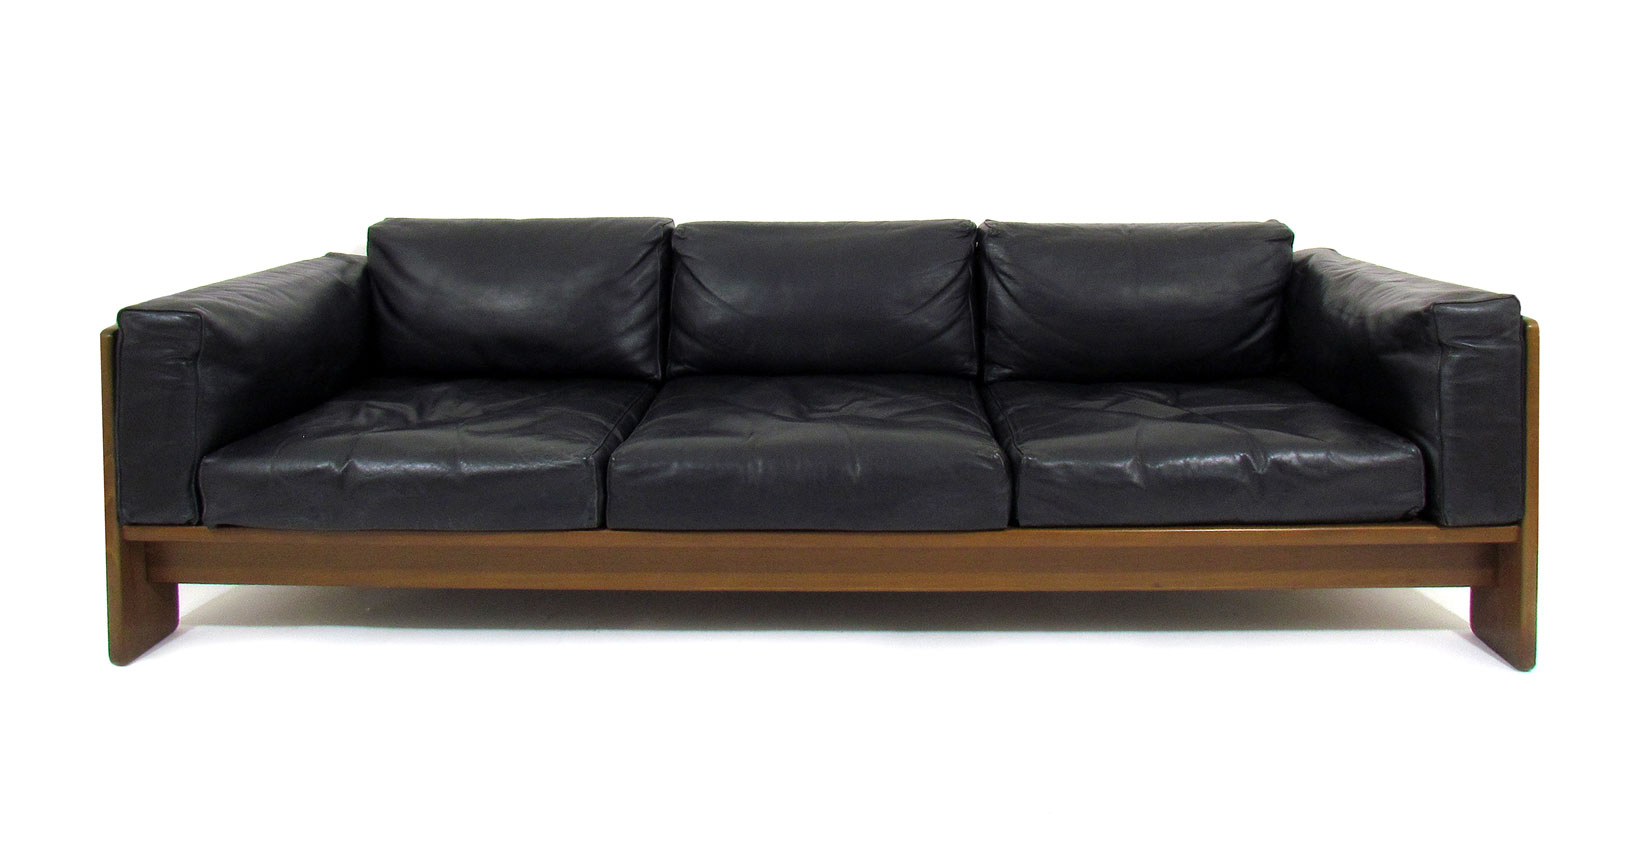 bastiano sofa tobia scarpa gavina knoll design vintage iconicdesign leather pelle furniture divano